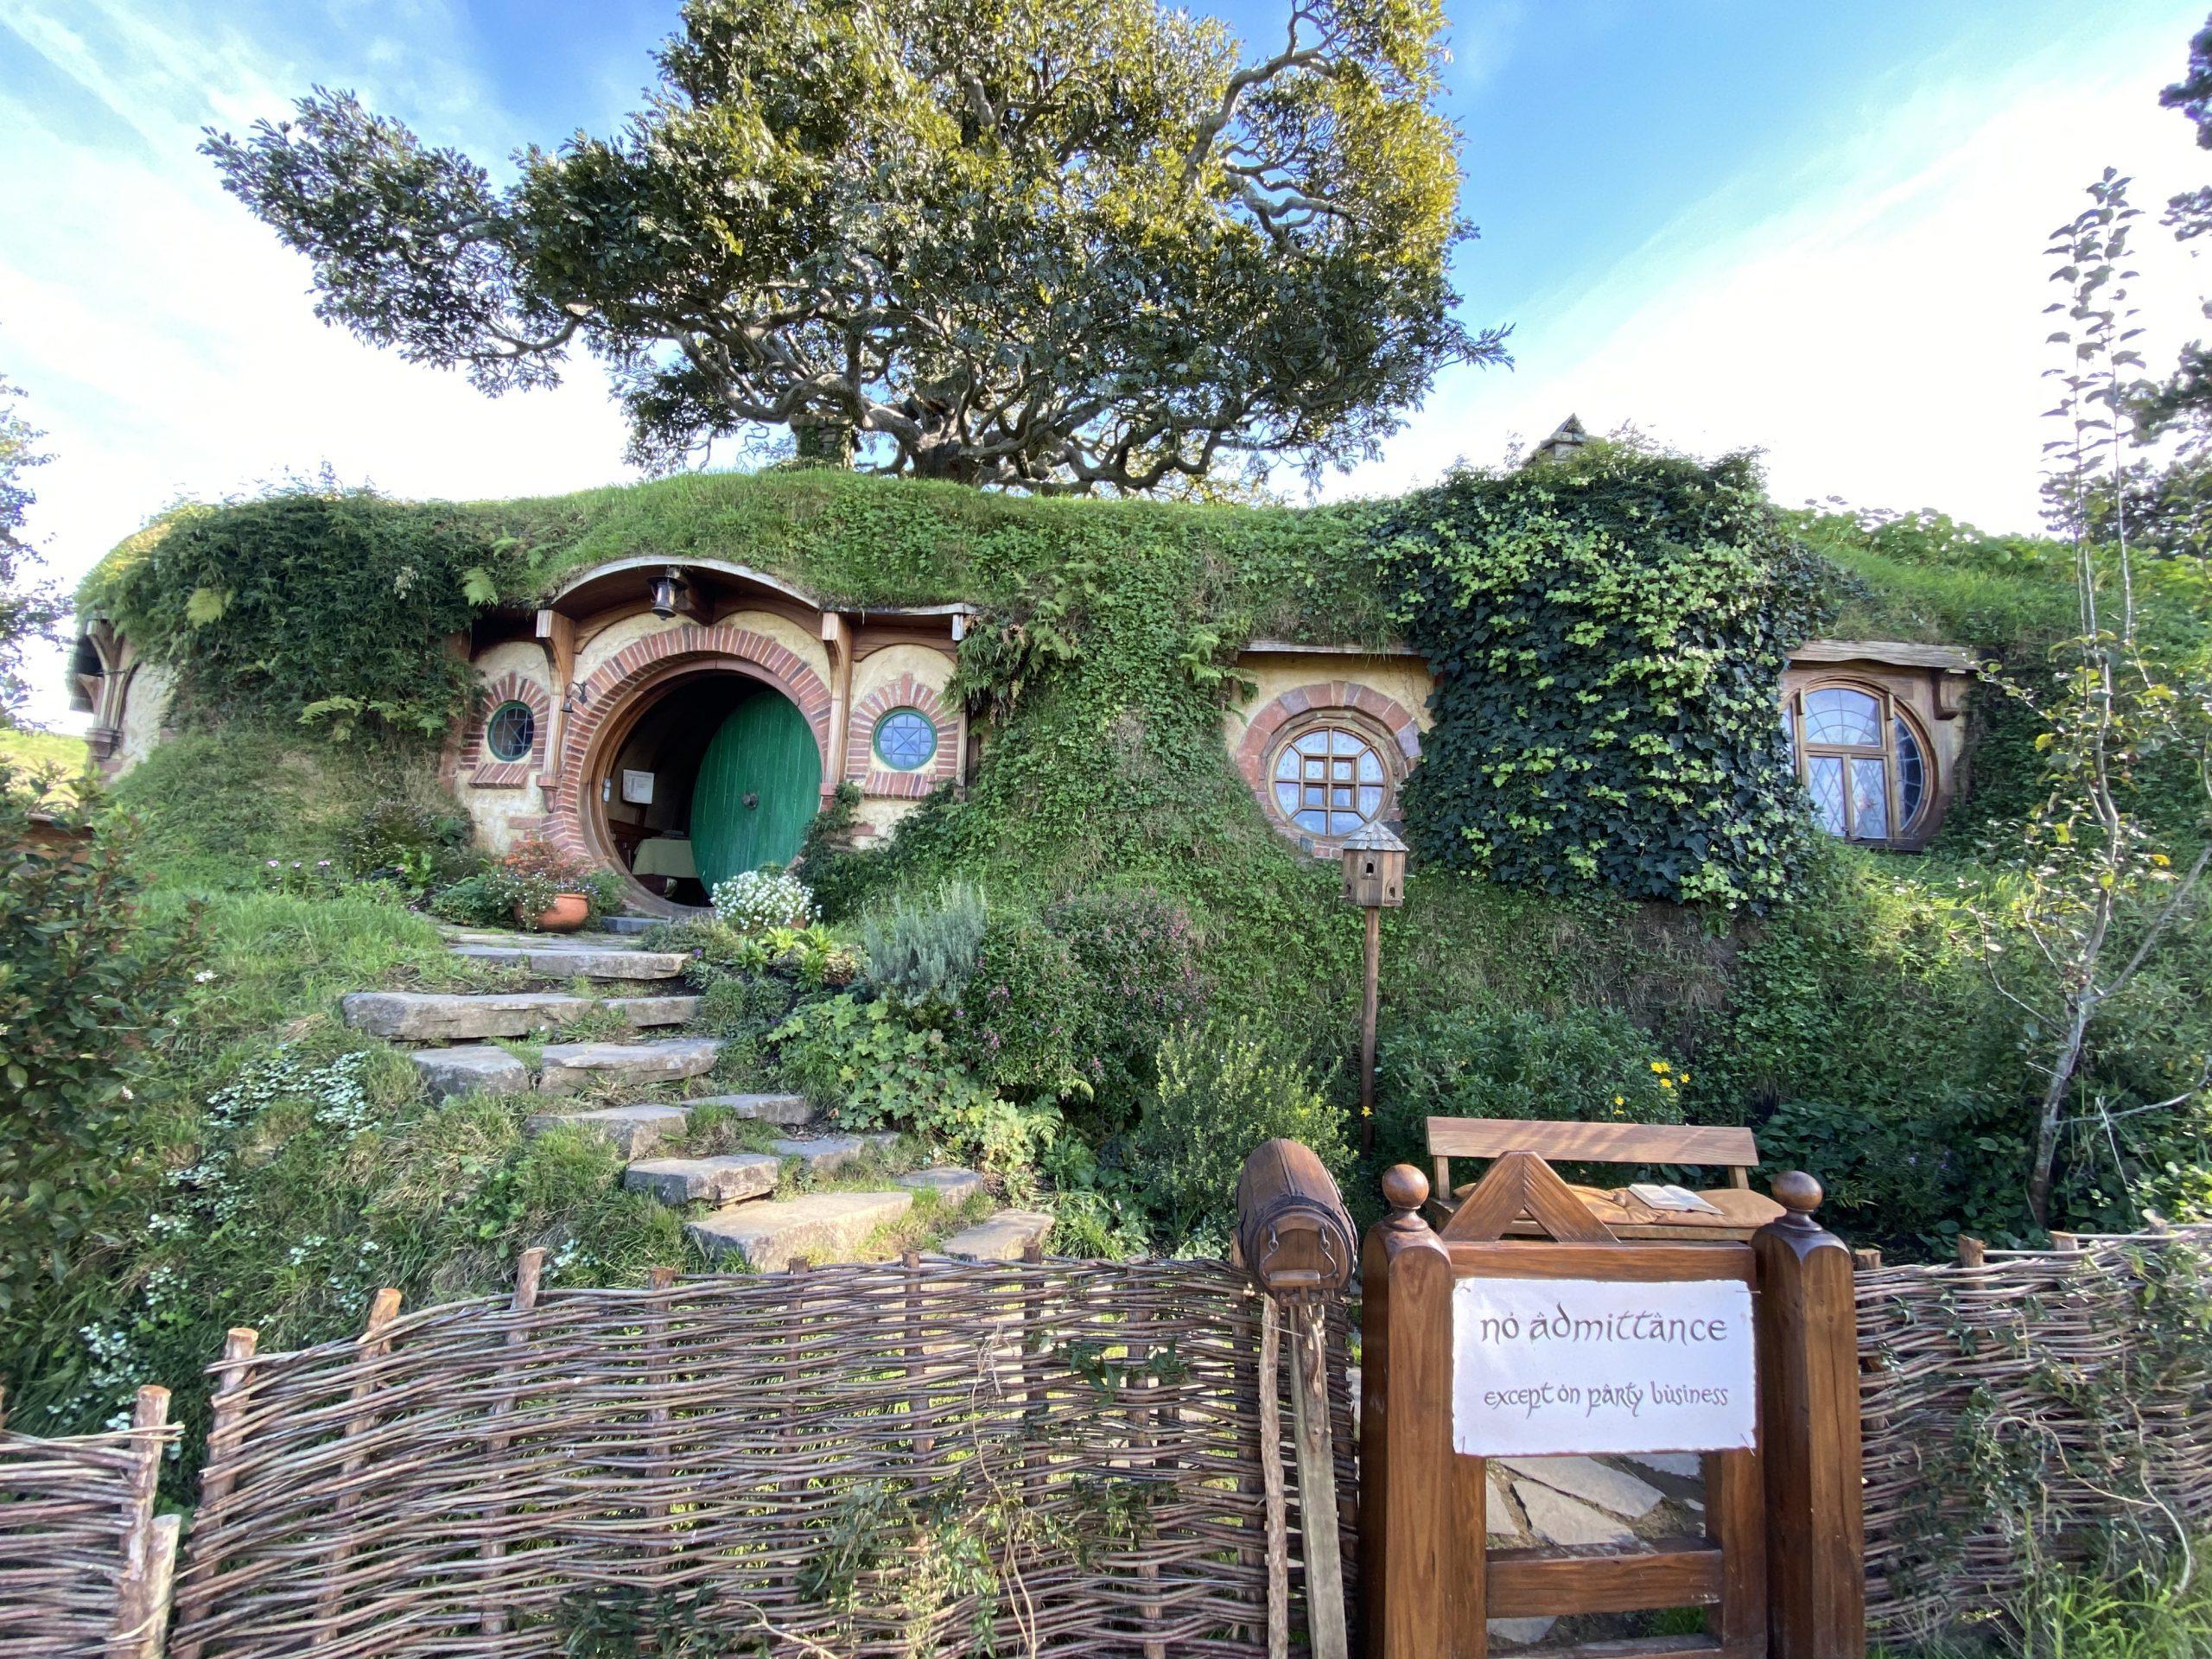 Bilbo Baggin's House at Bag End, Hobbiton Movie Set